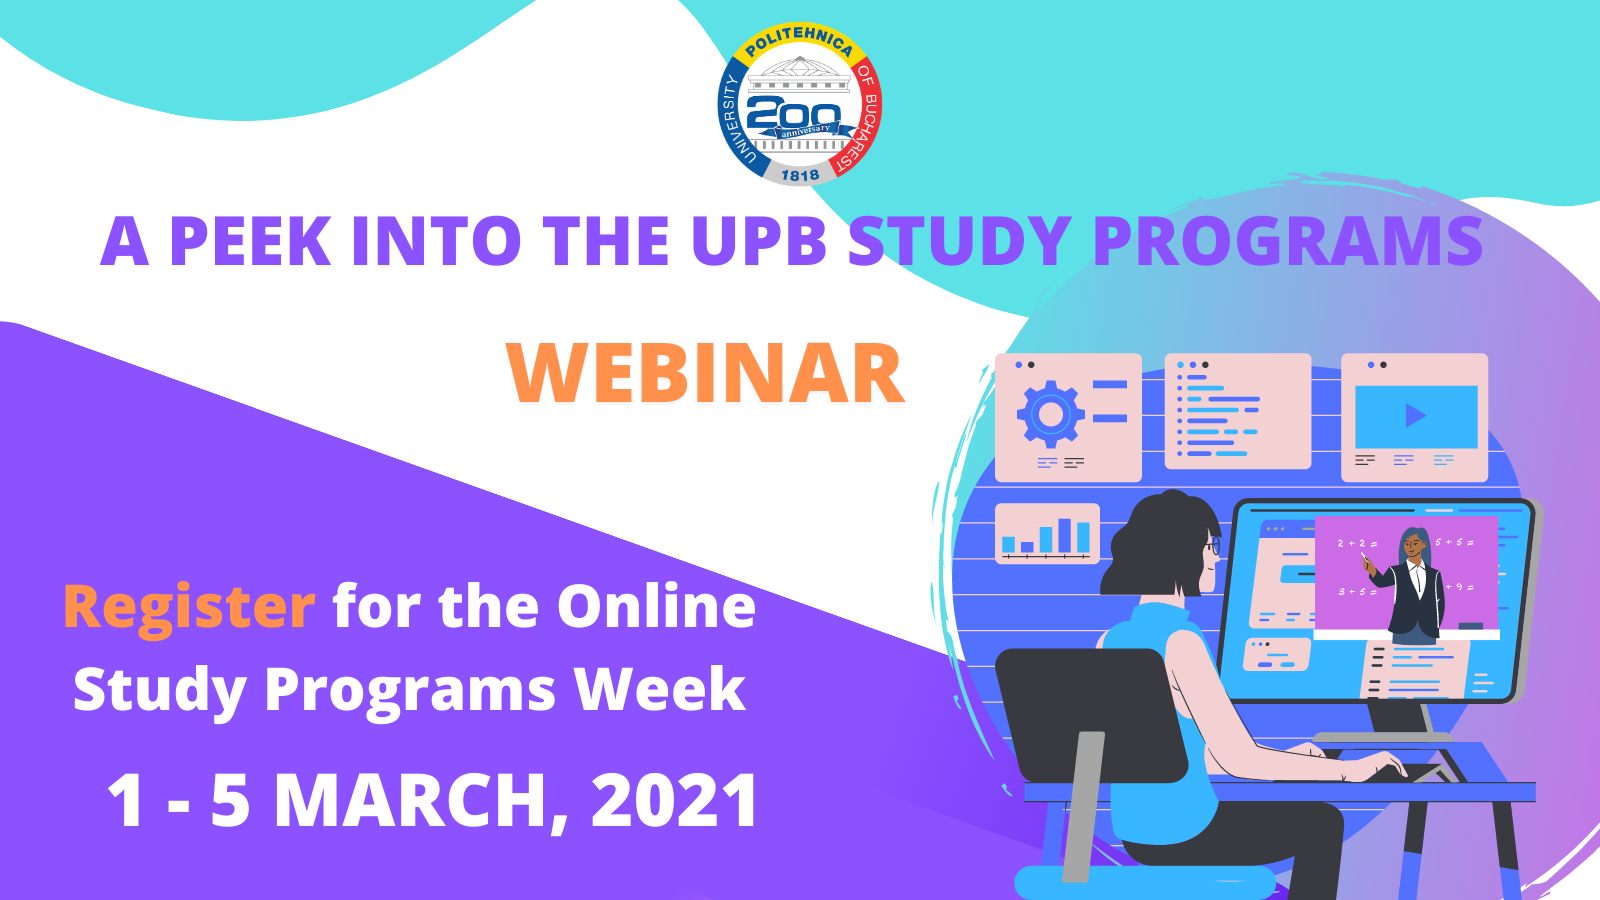 A peek into the UPB study programs